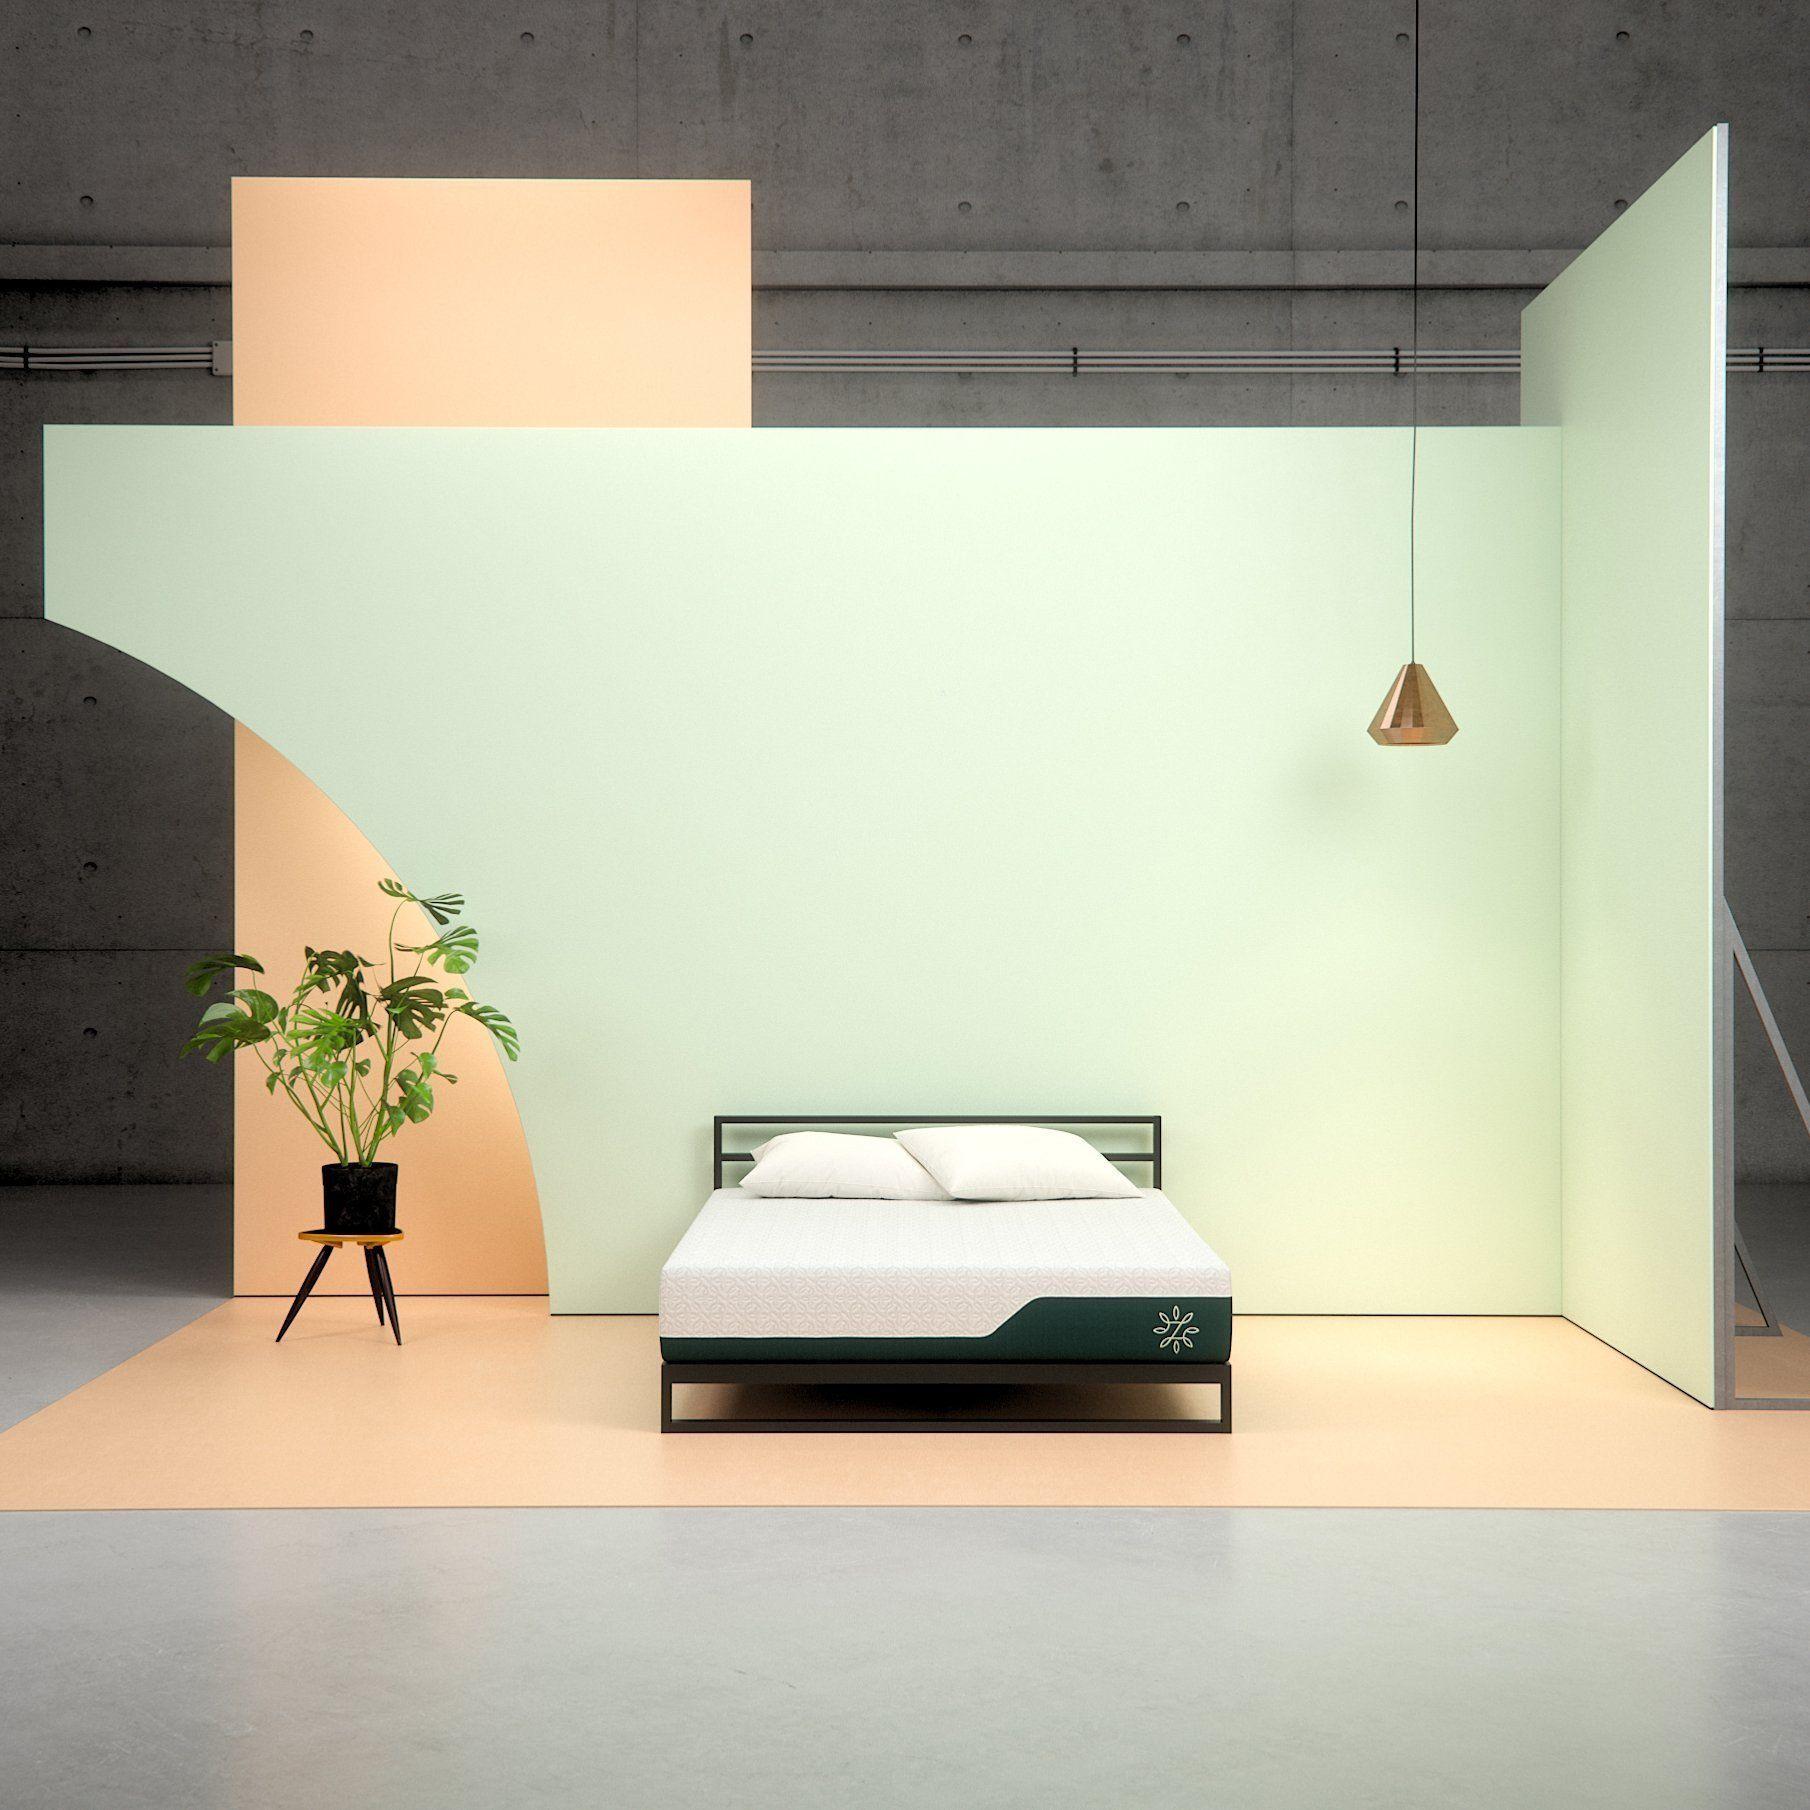 Pressure Relief Euro Top Icoil Hybrid Mattress Adjustable Bed Frame Furniture Furniture Styles